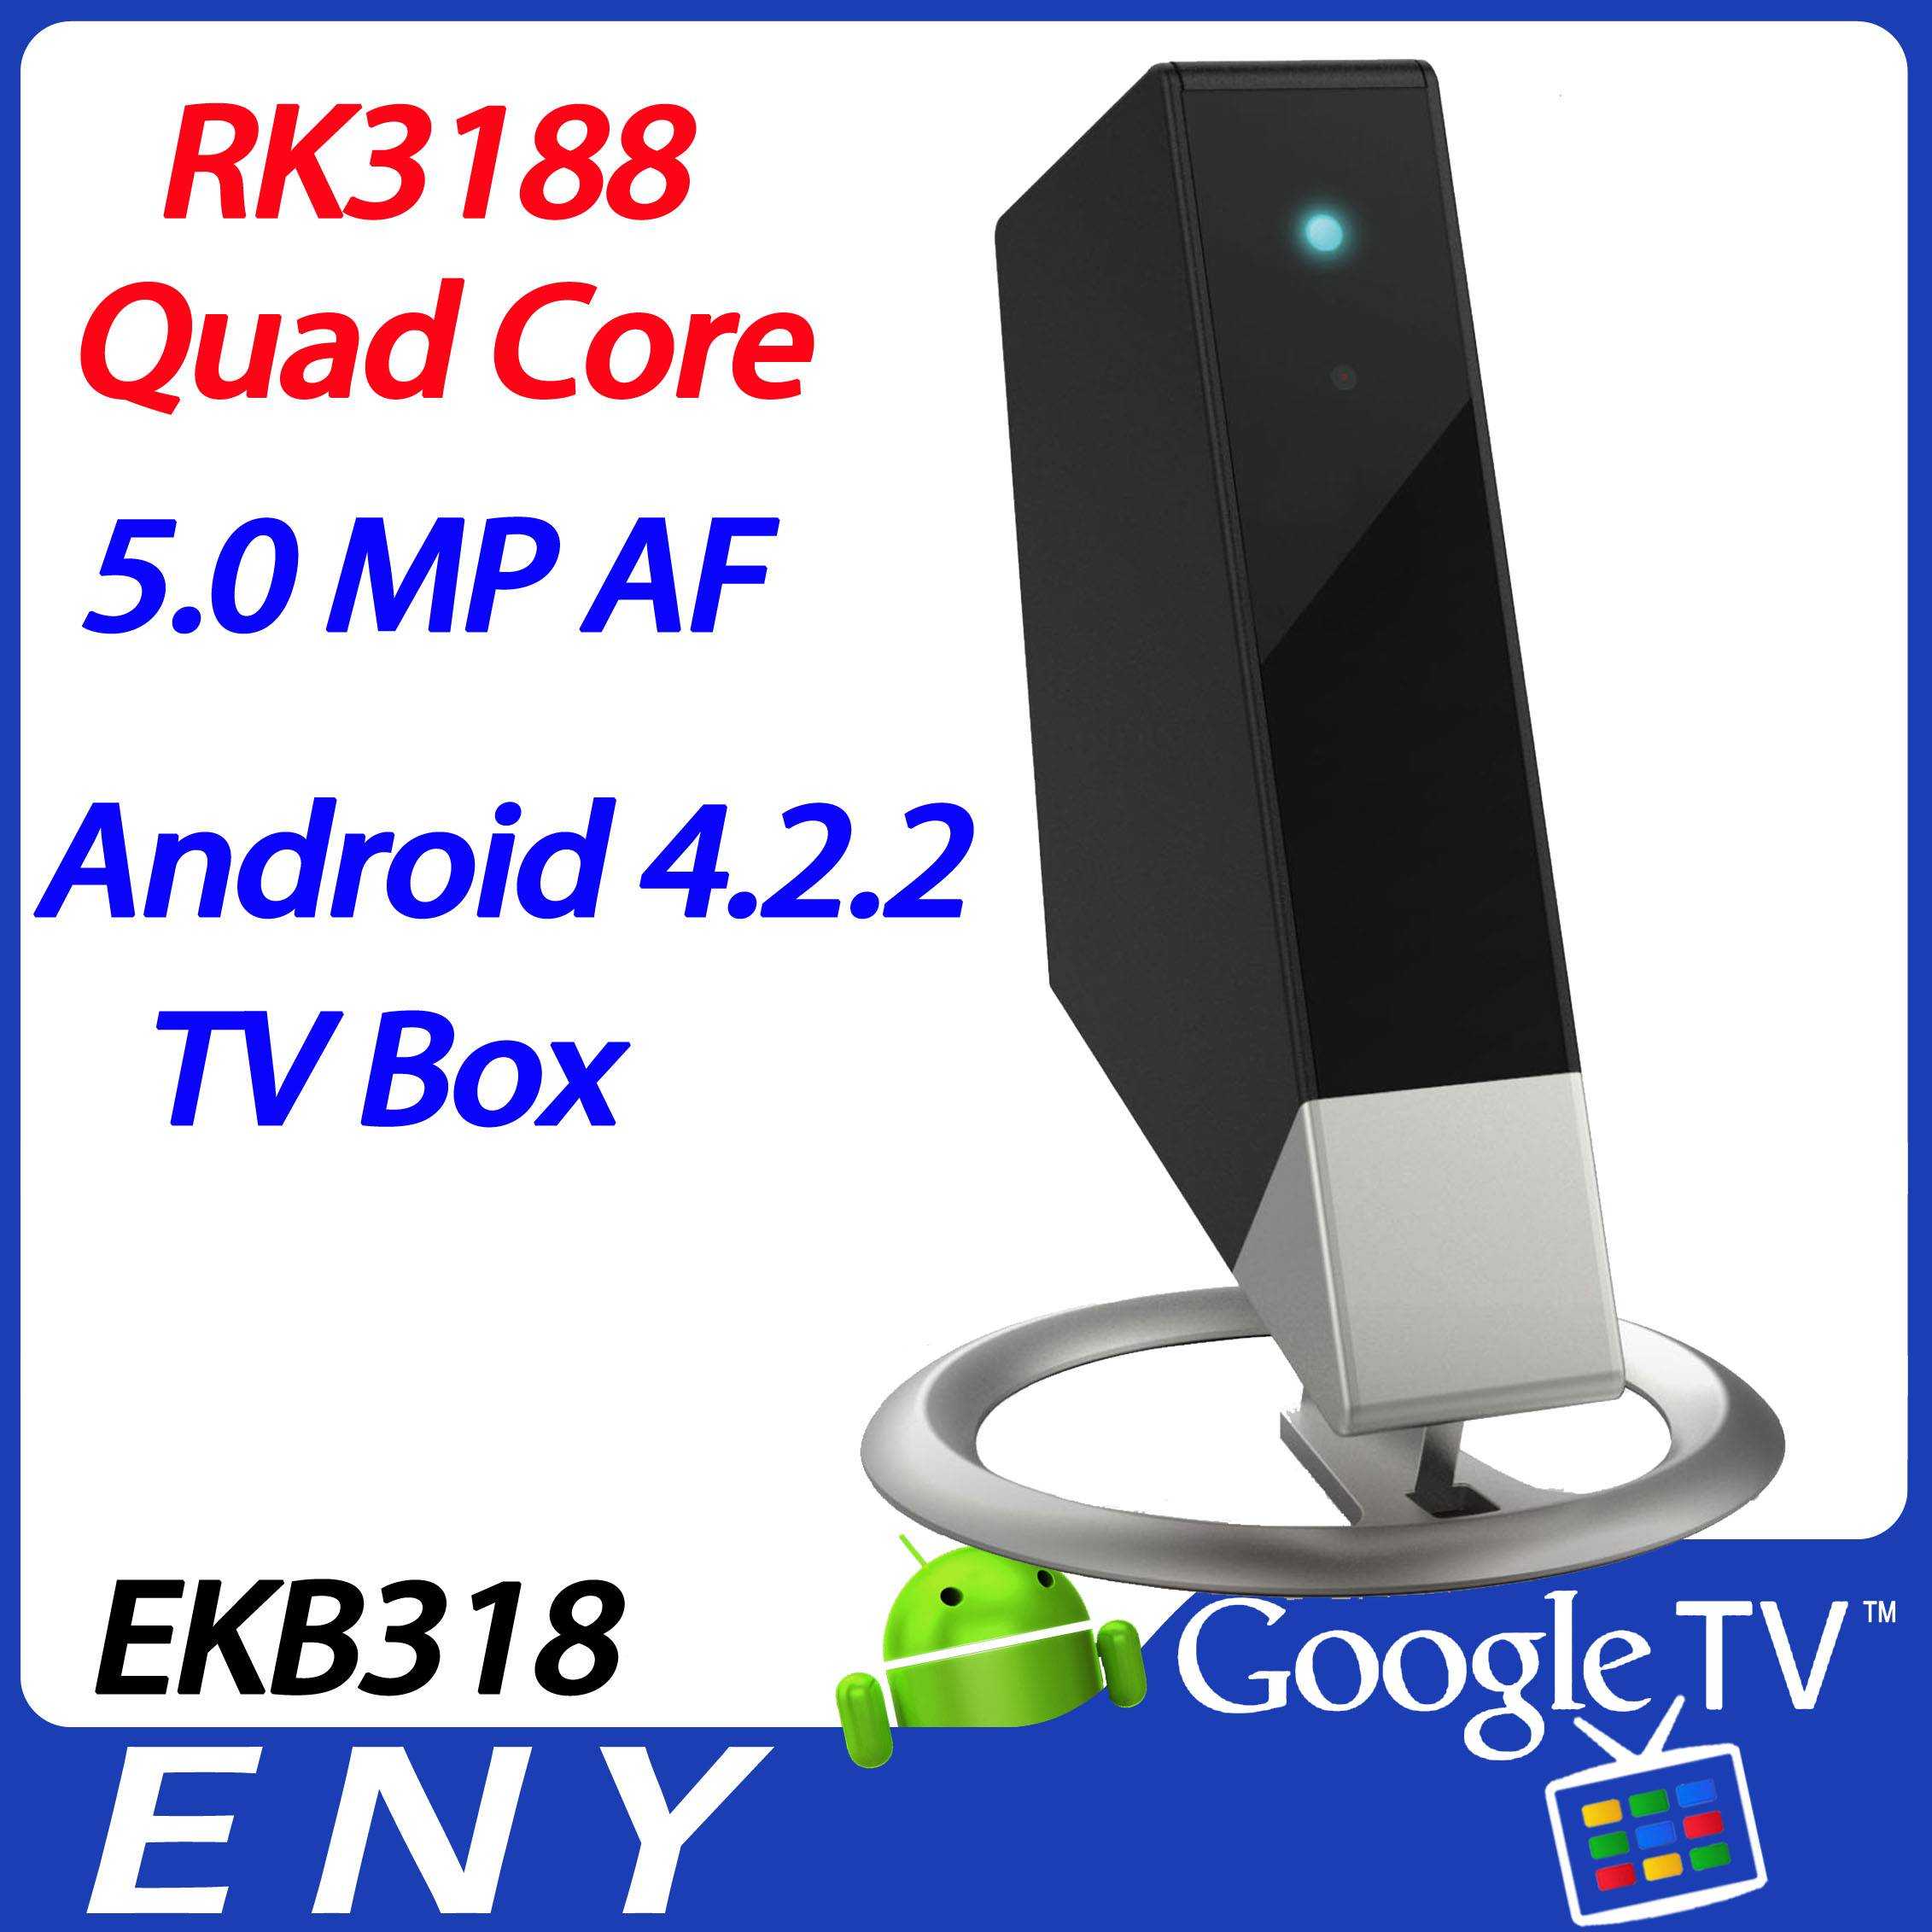 EKB318 RK3188 Android 4.2.2 tv box camera quad core full hd media player HDMI remote control